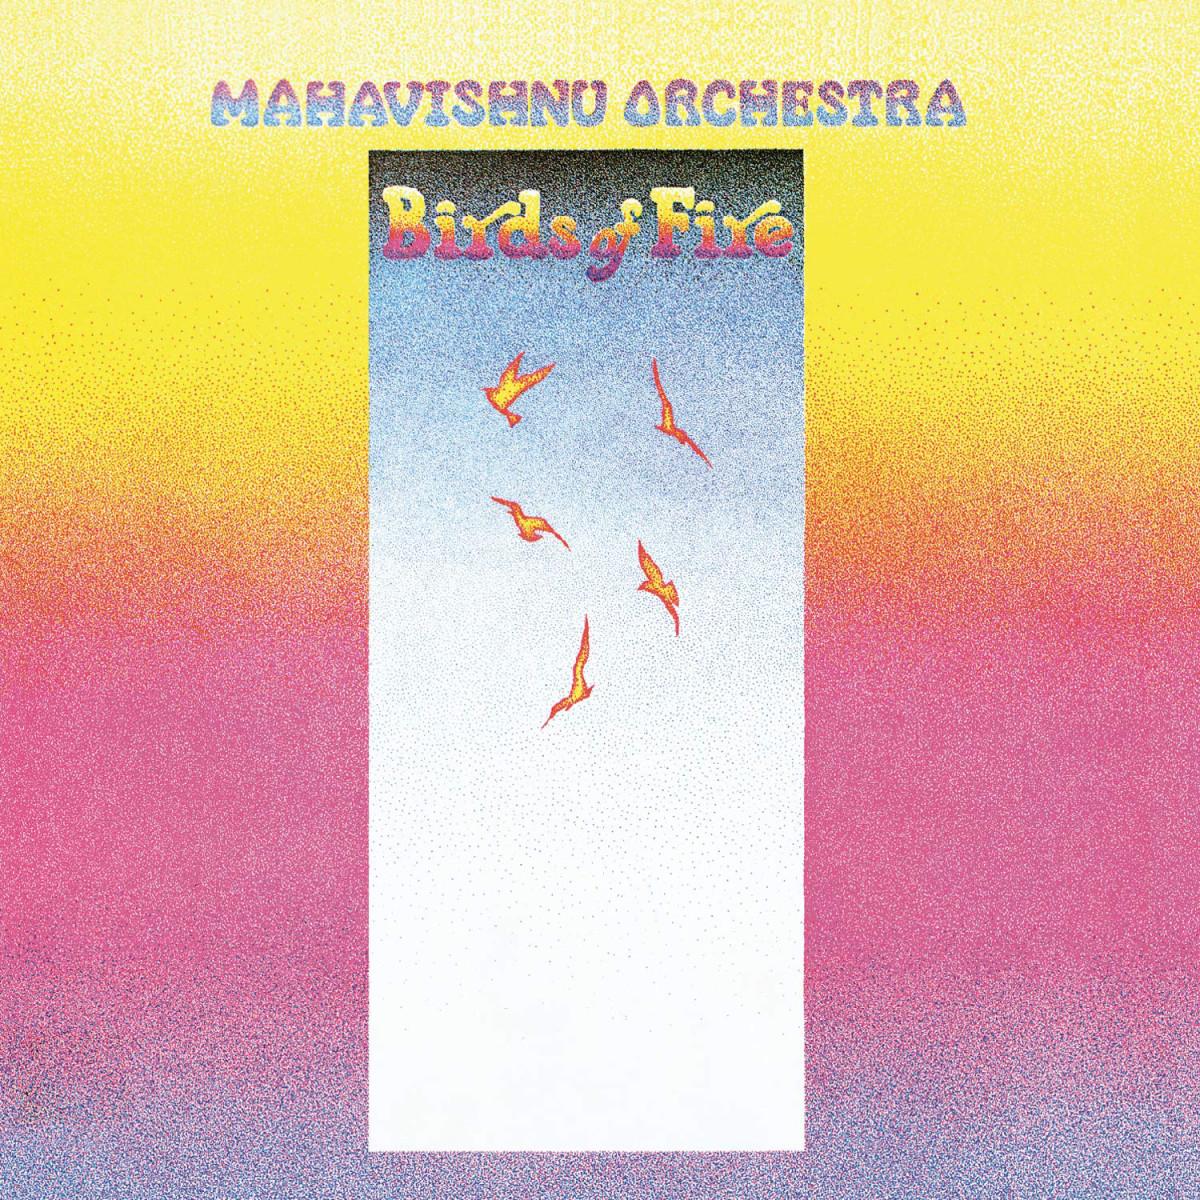 Mahavishnu Orchestra, Birds of Fire